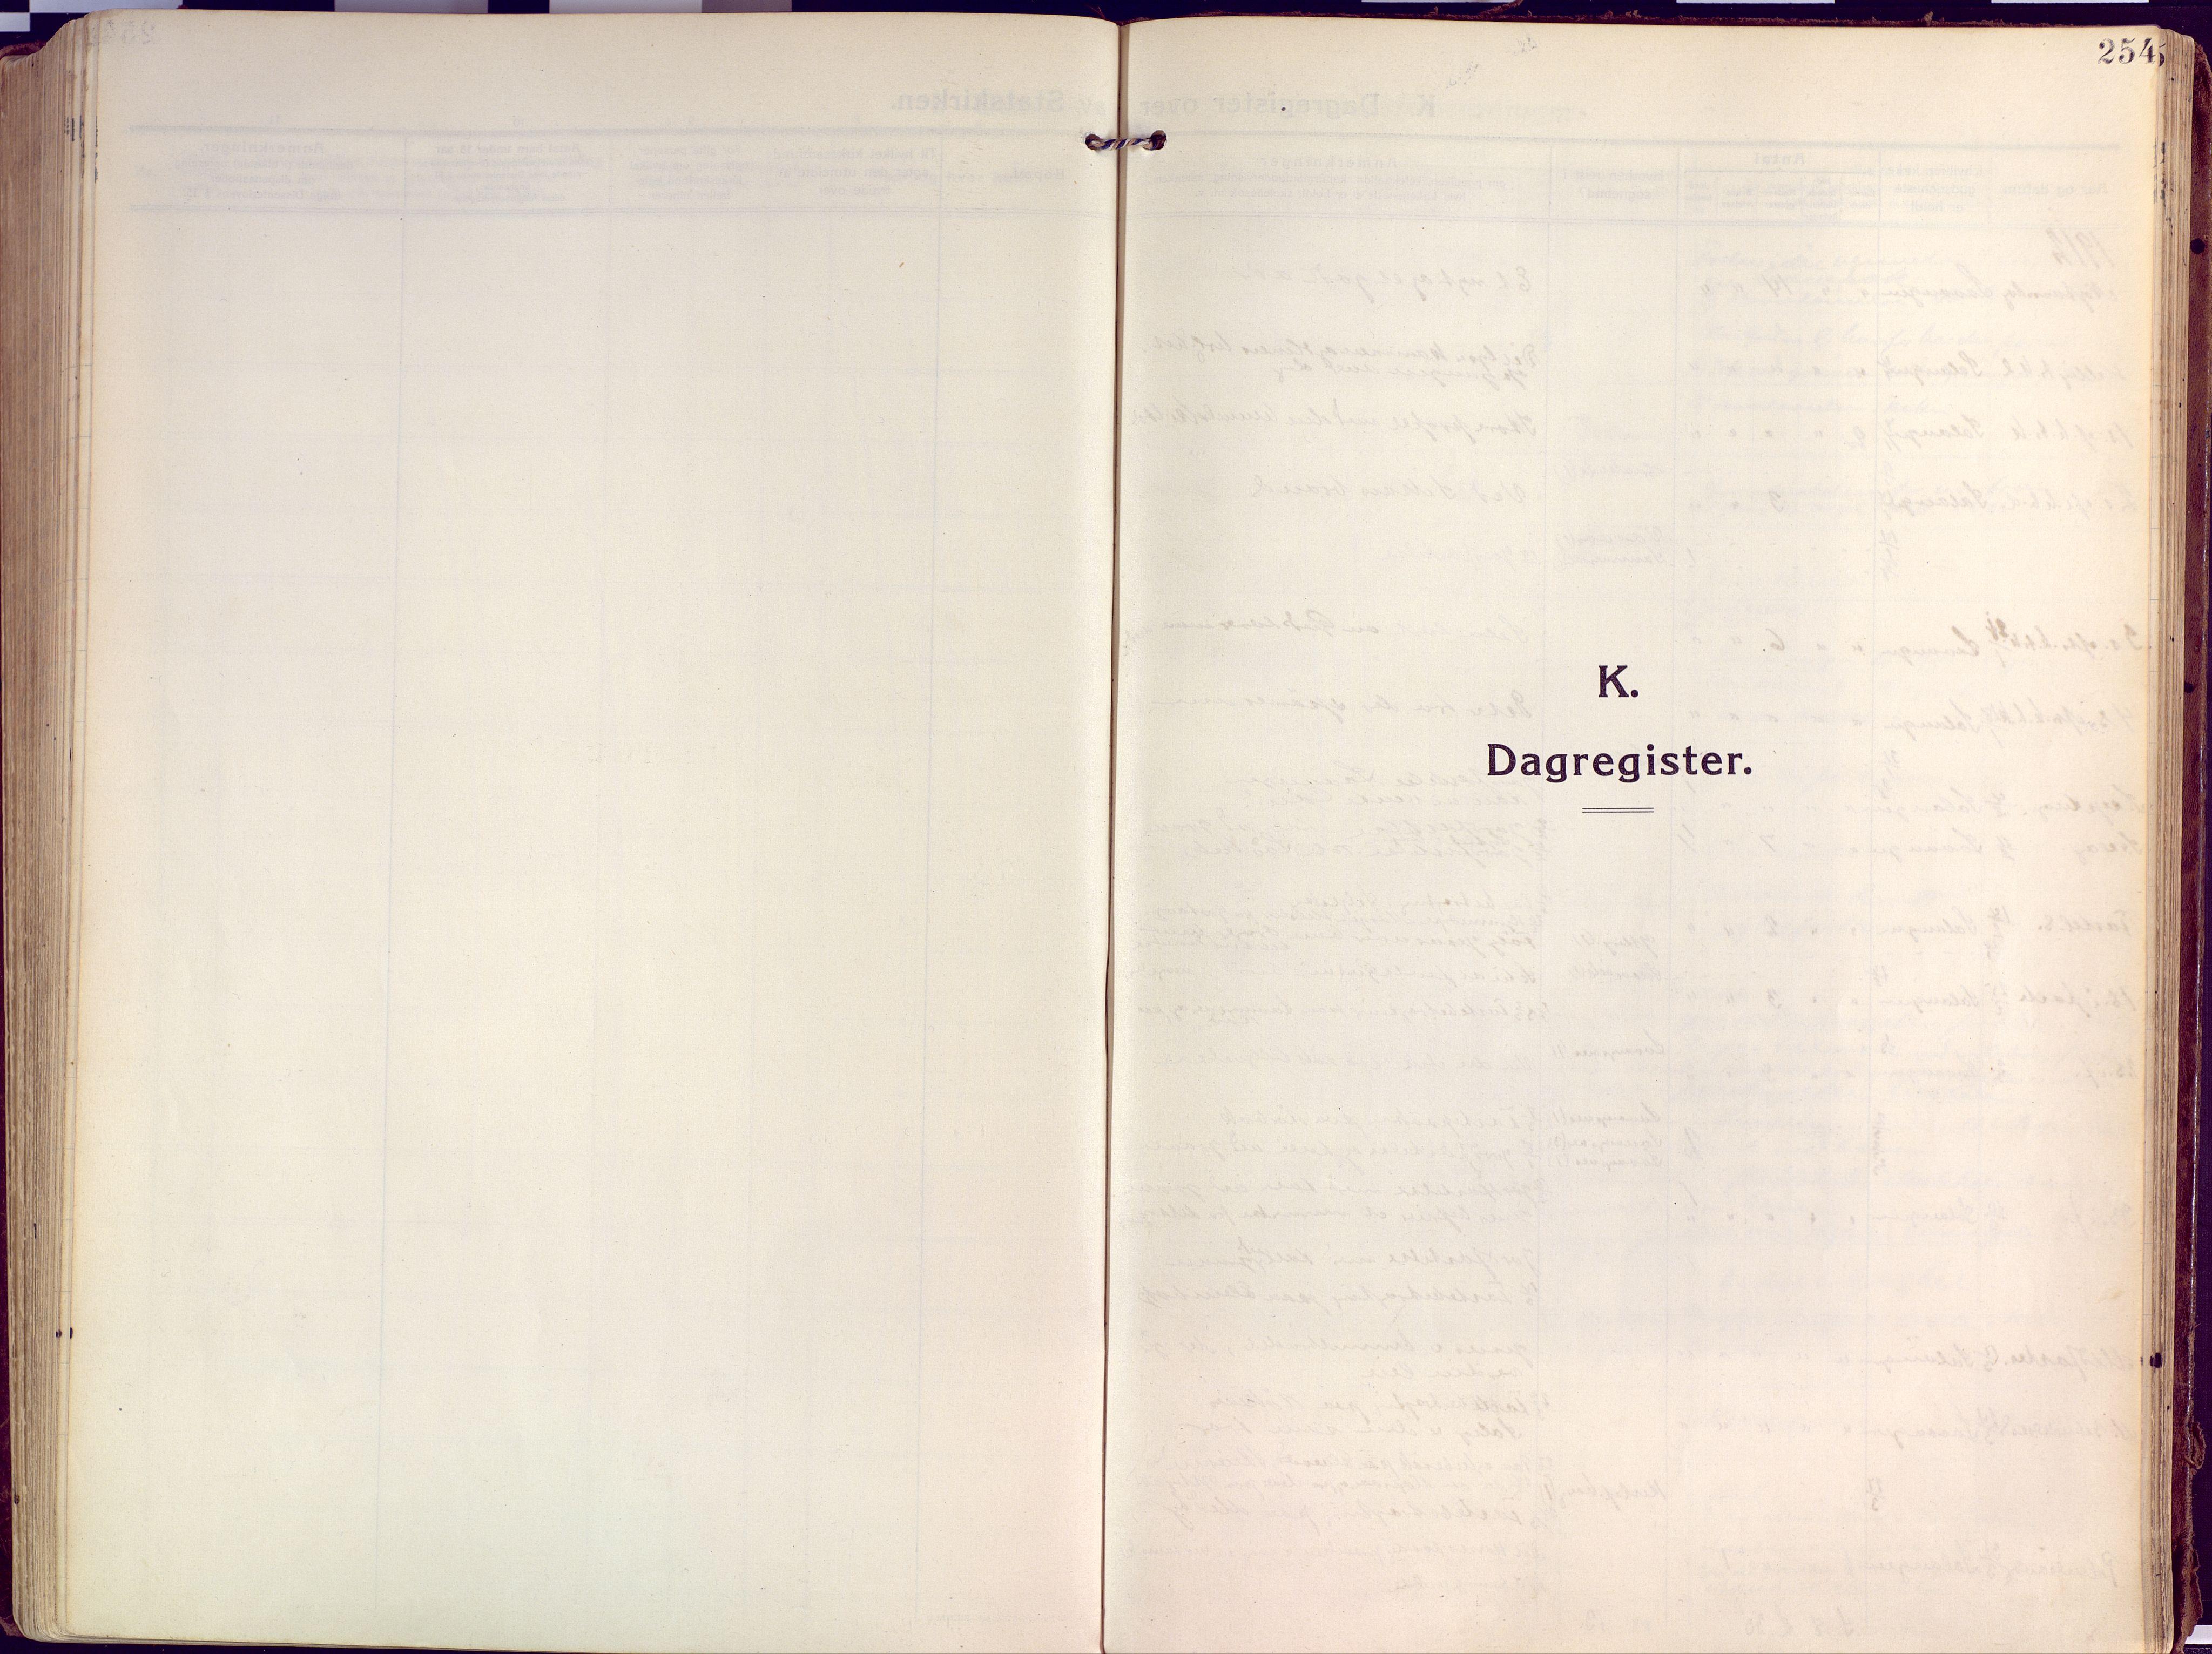 SATØ, Salangen sokneprestembete, H/Ha/L0004kirke: Parish register (official) no. 4, 1912-1927, p. 254